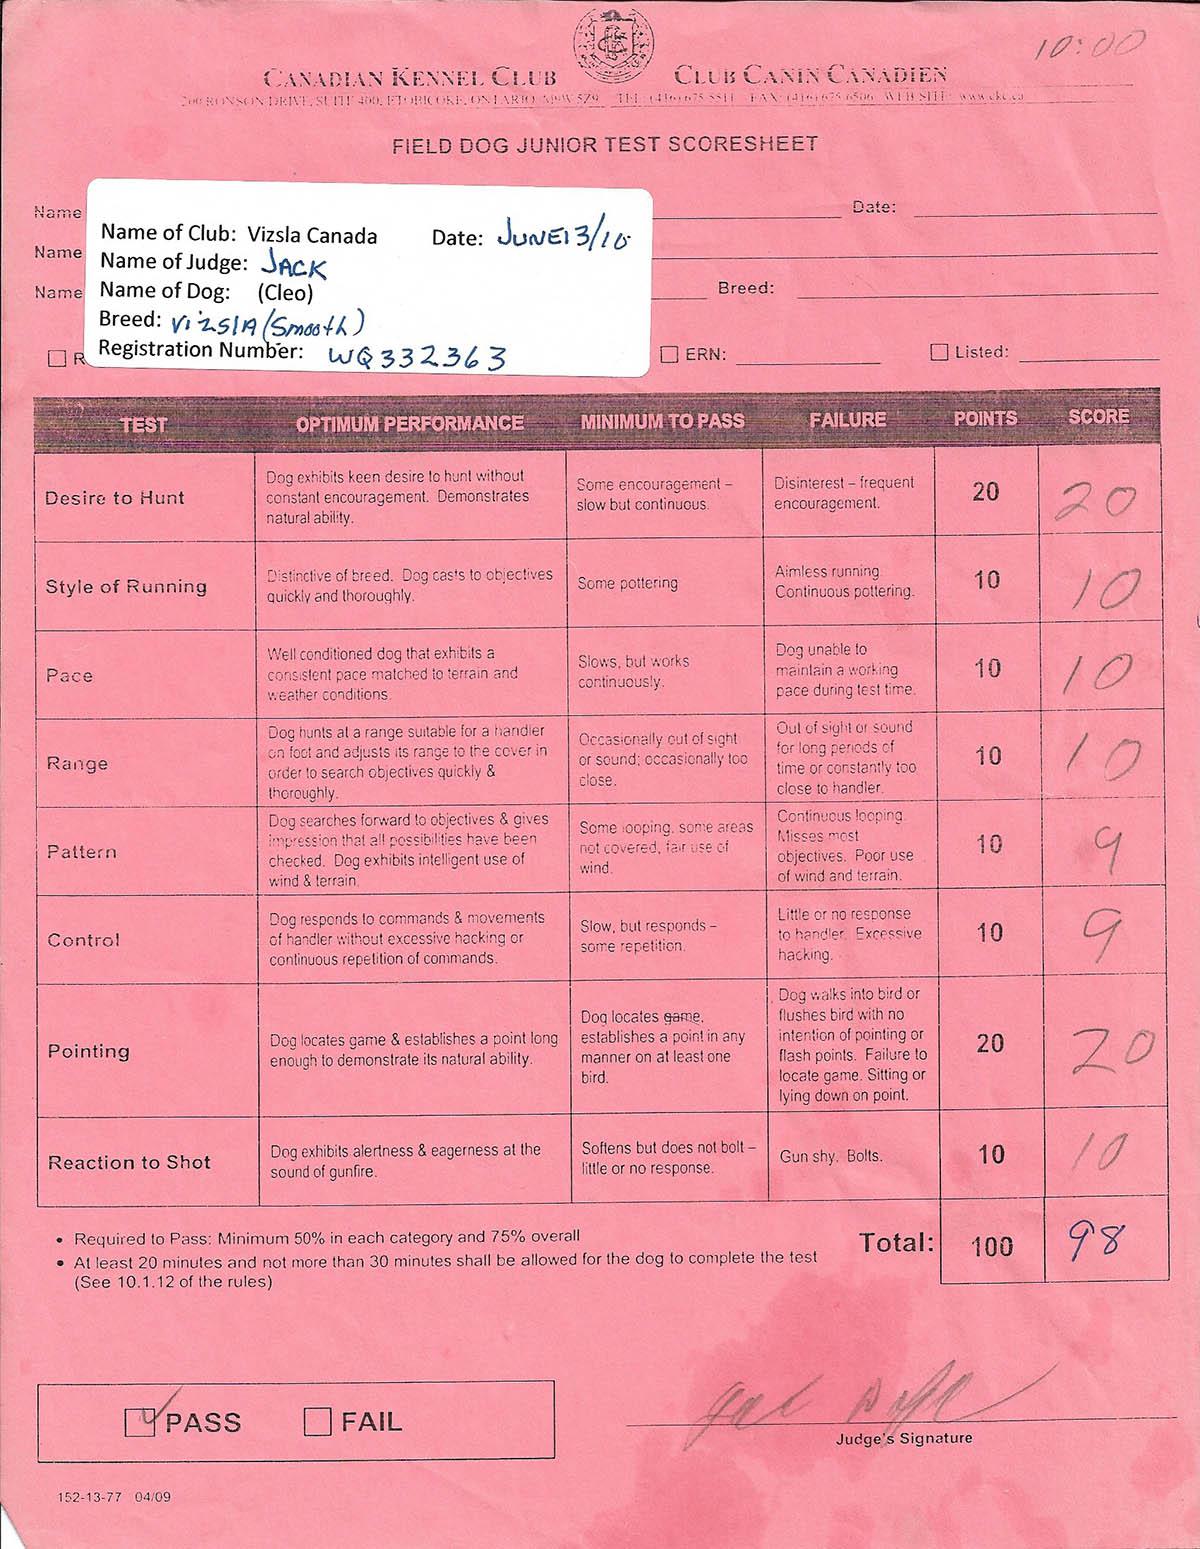 Canadian Kennel Club, Field Dog Junior Test Scoresheet